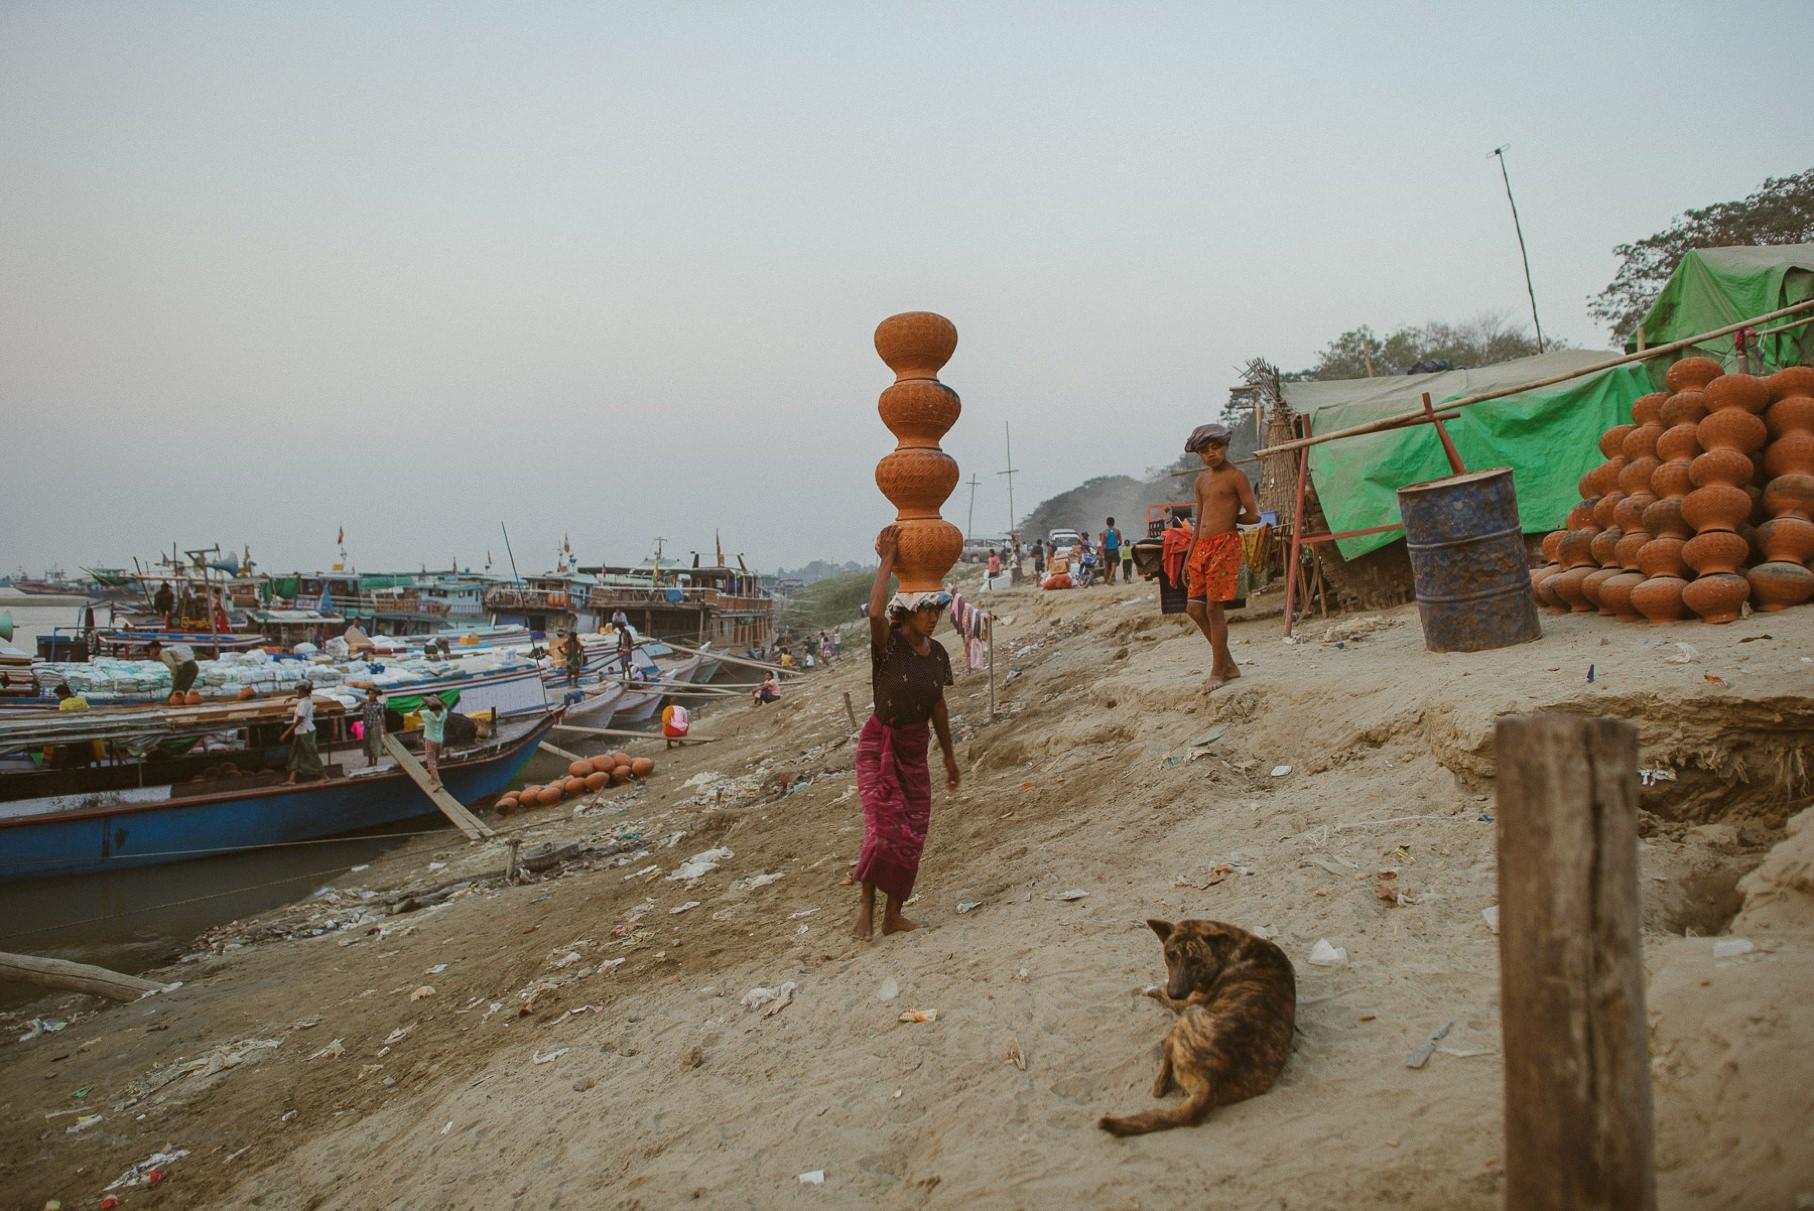 0067 yangon mandalay d76 7101 - Großstädte Myanmars - Yangon & Mandalay